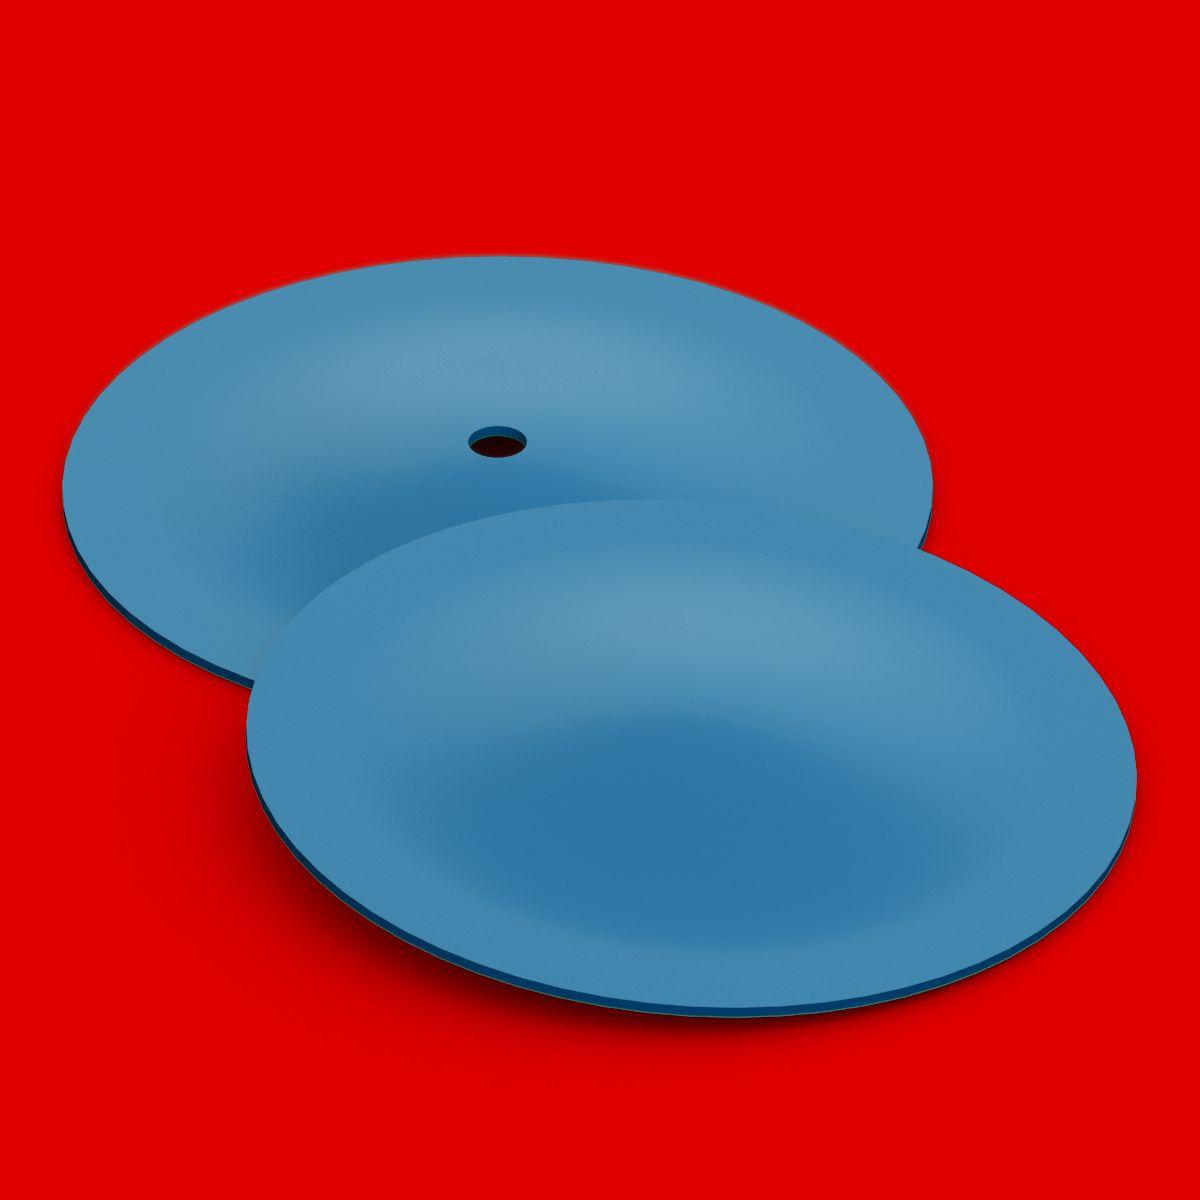 TFC Schleuderguss HTV Silikon Scheibenset HB 580C 300x10mm blau